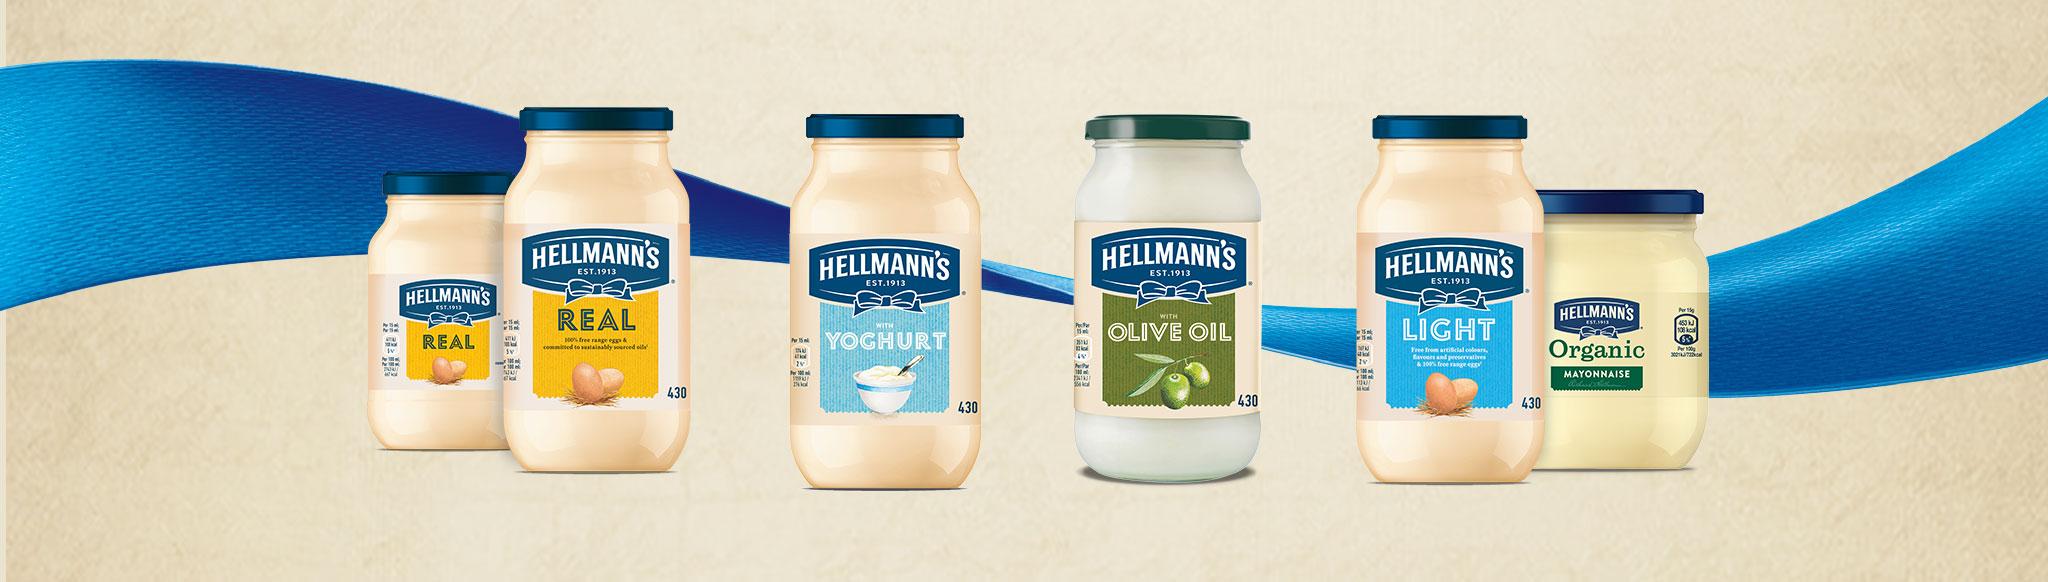 New Hellmans